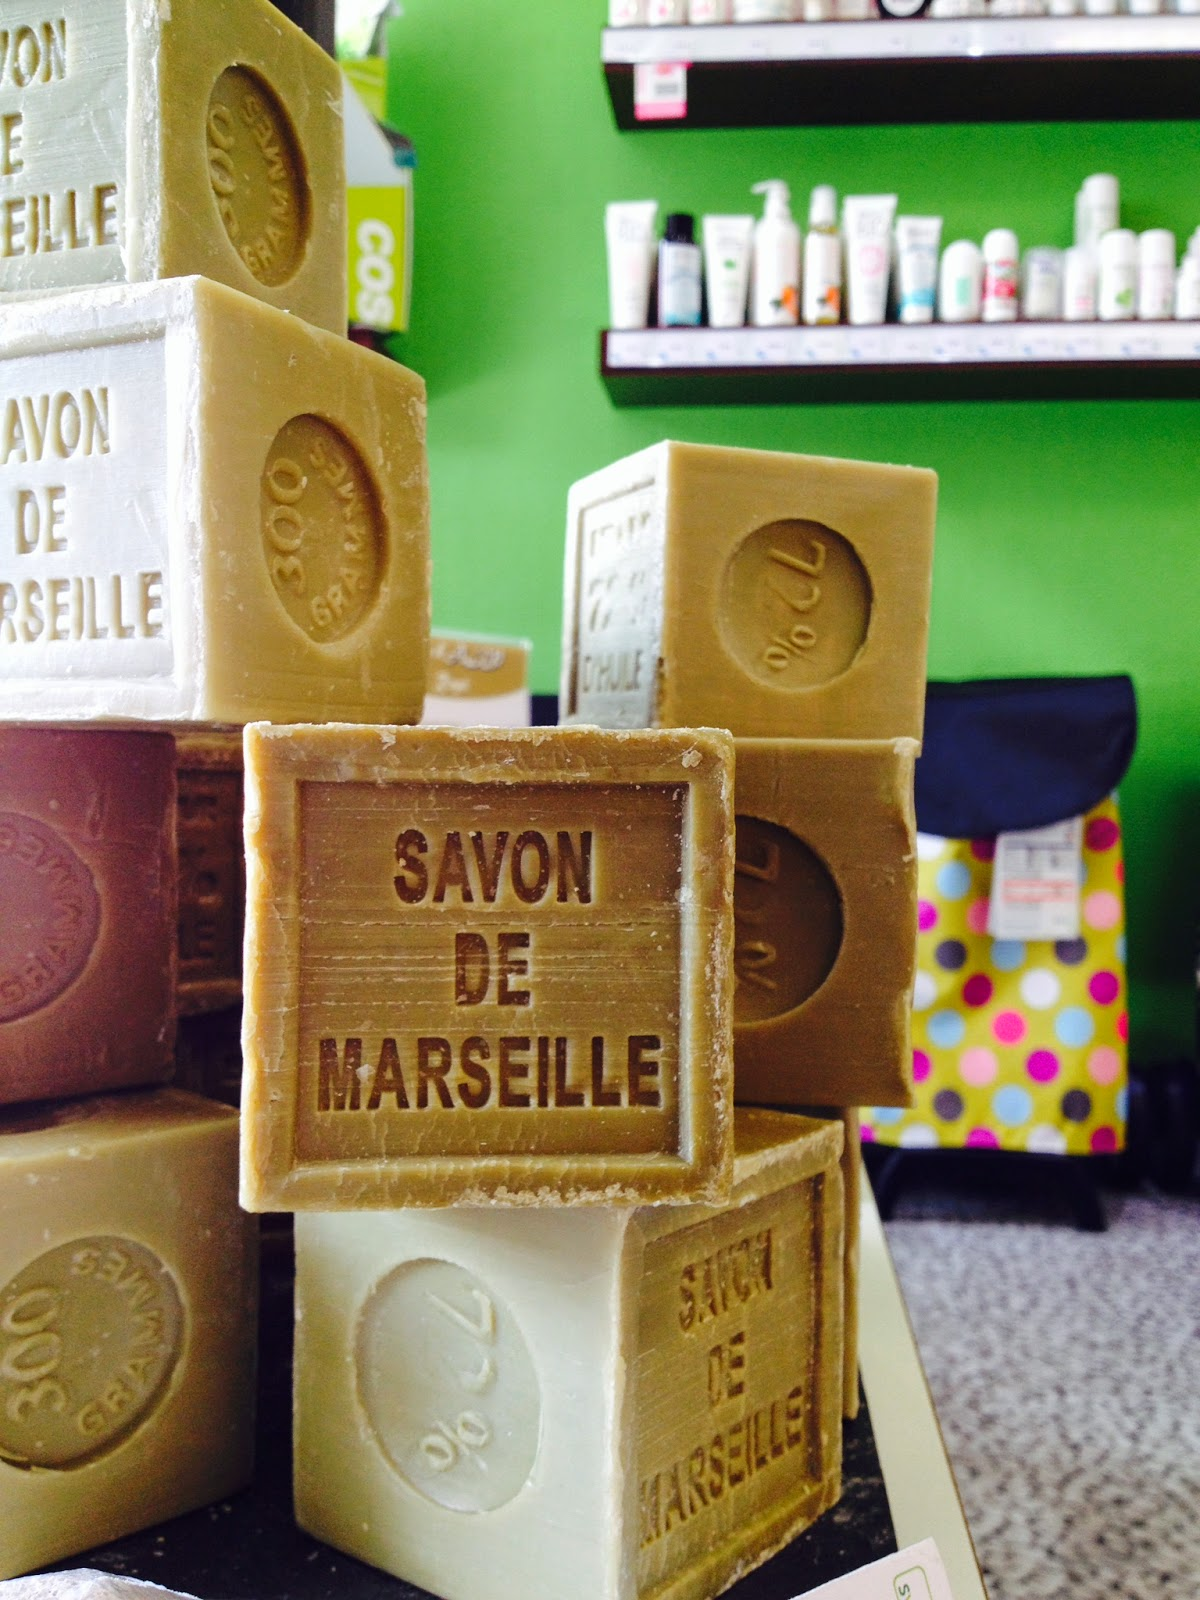 Blog bio reims le v ritable savon de marseille cube - Savon de marseille veritable ...